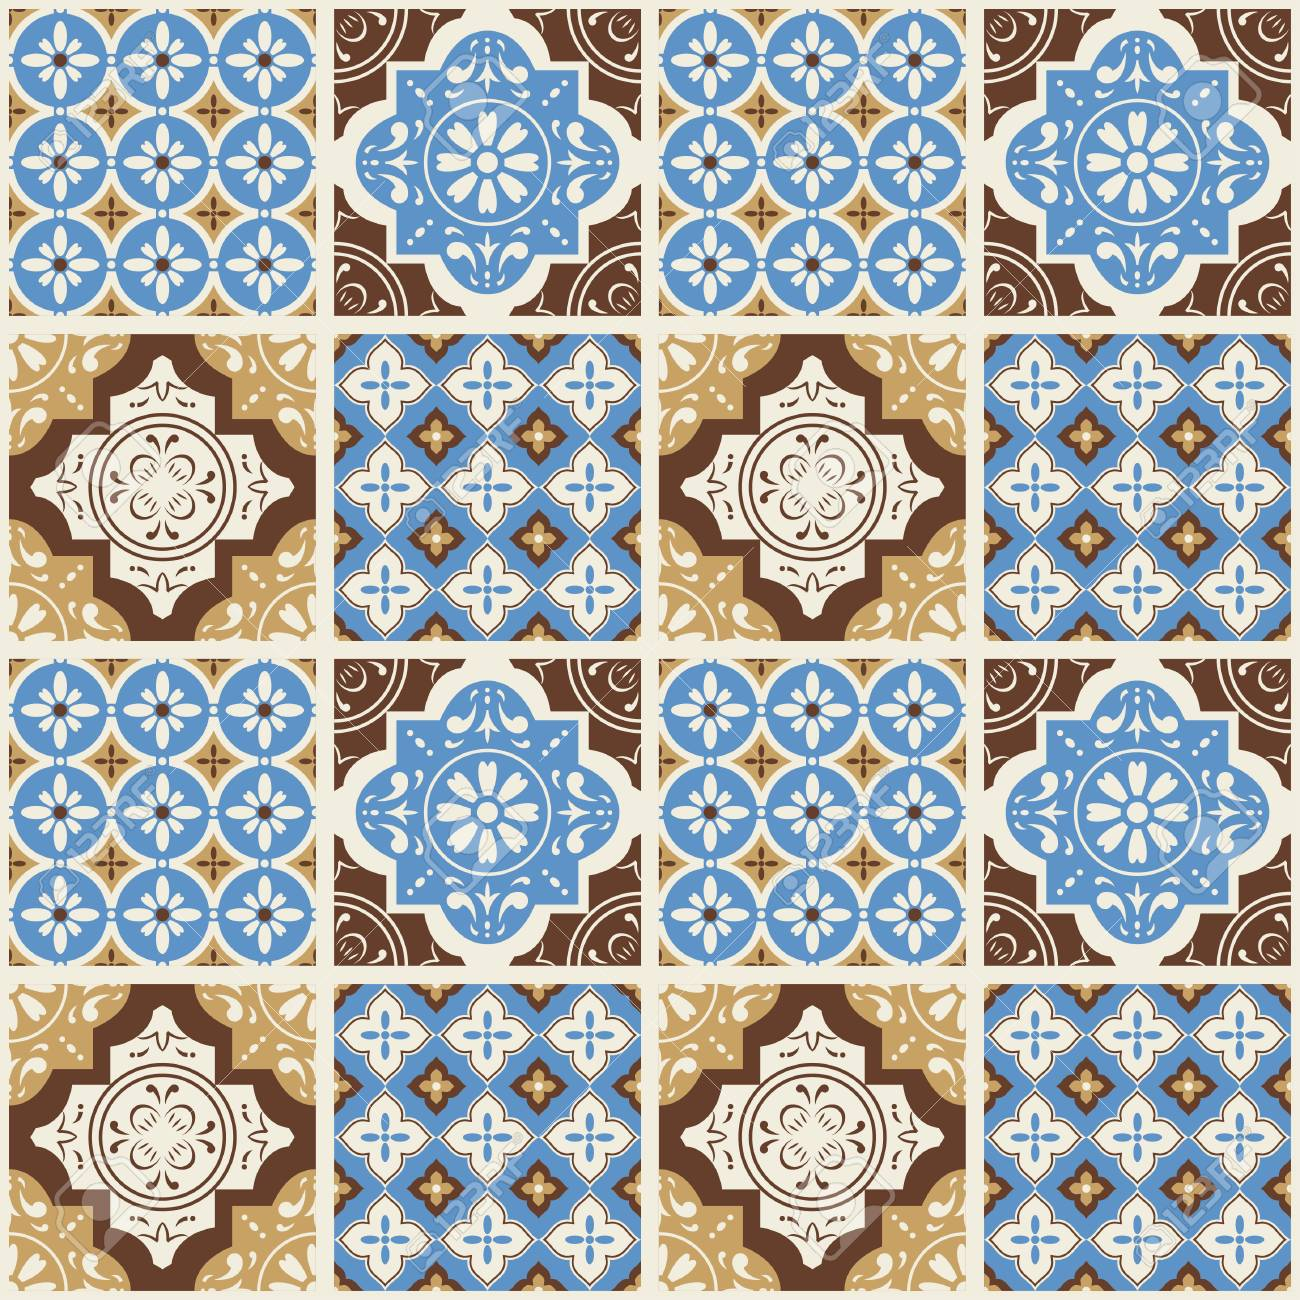 Decorative Tile Pattern Design. Vector Illustration. Royalty Free ...